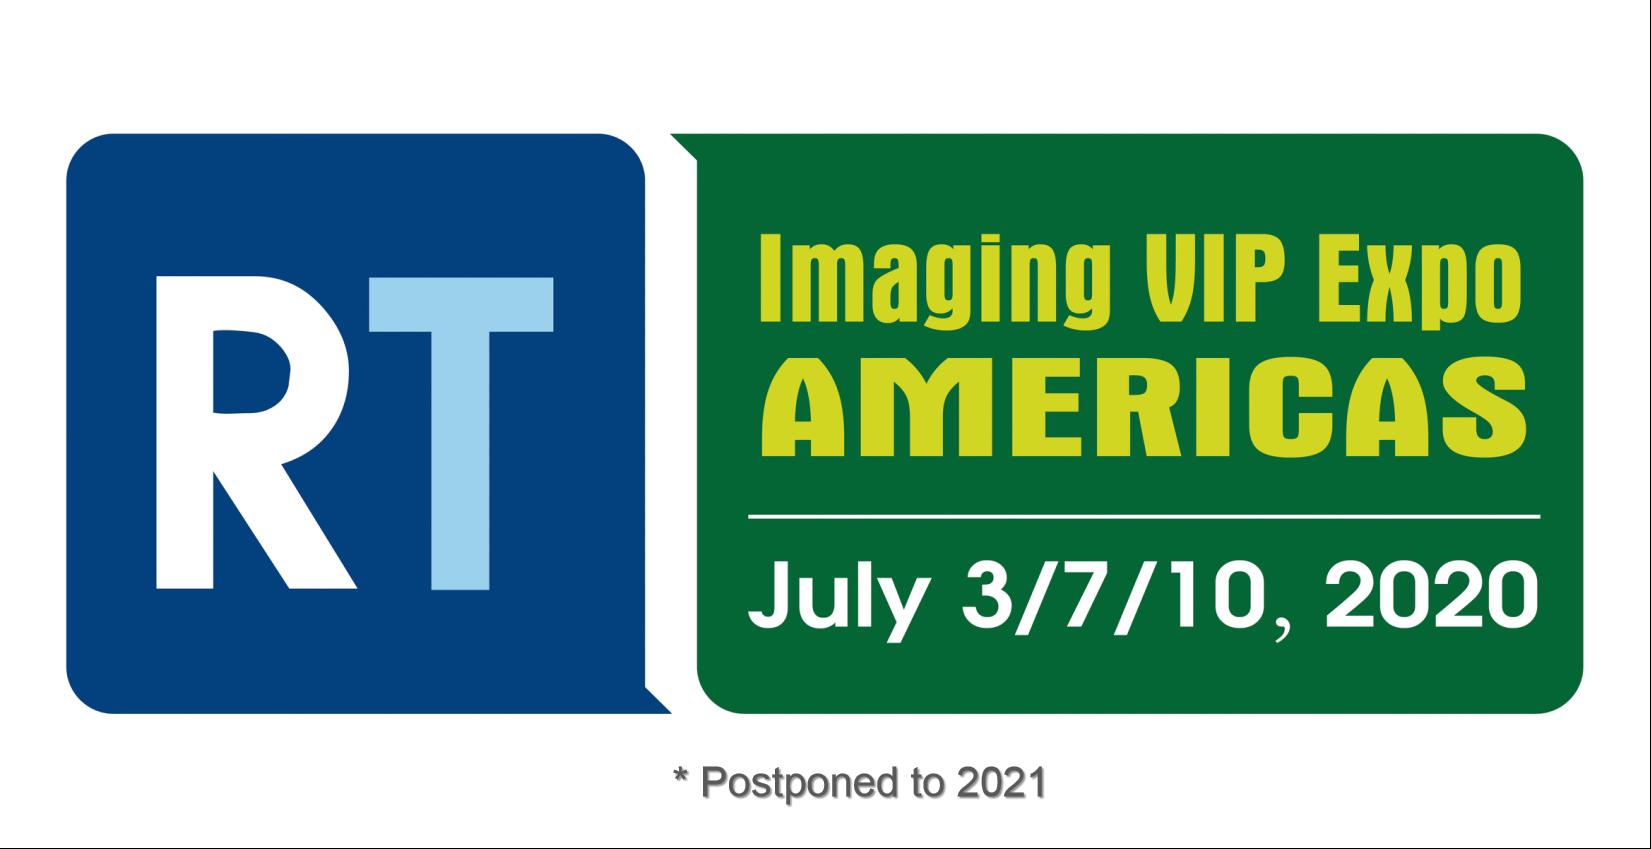 rt,imaging,vip,expo,americas,2020